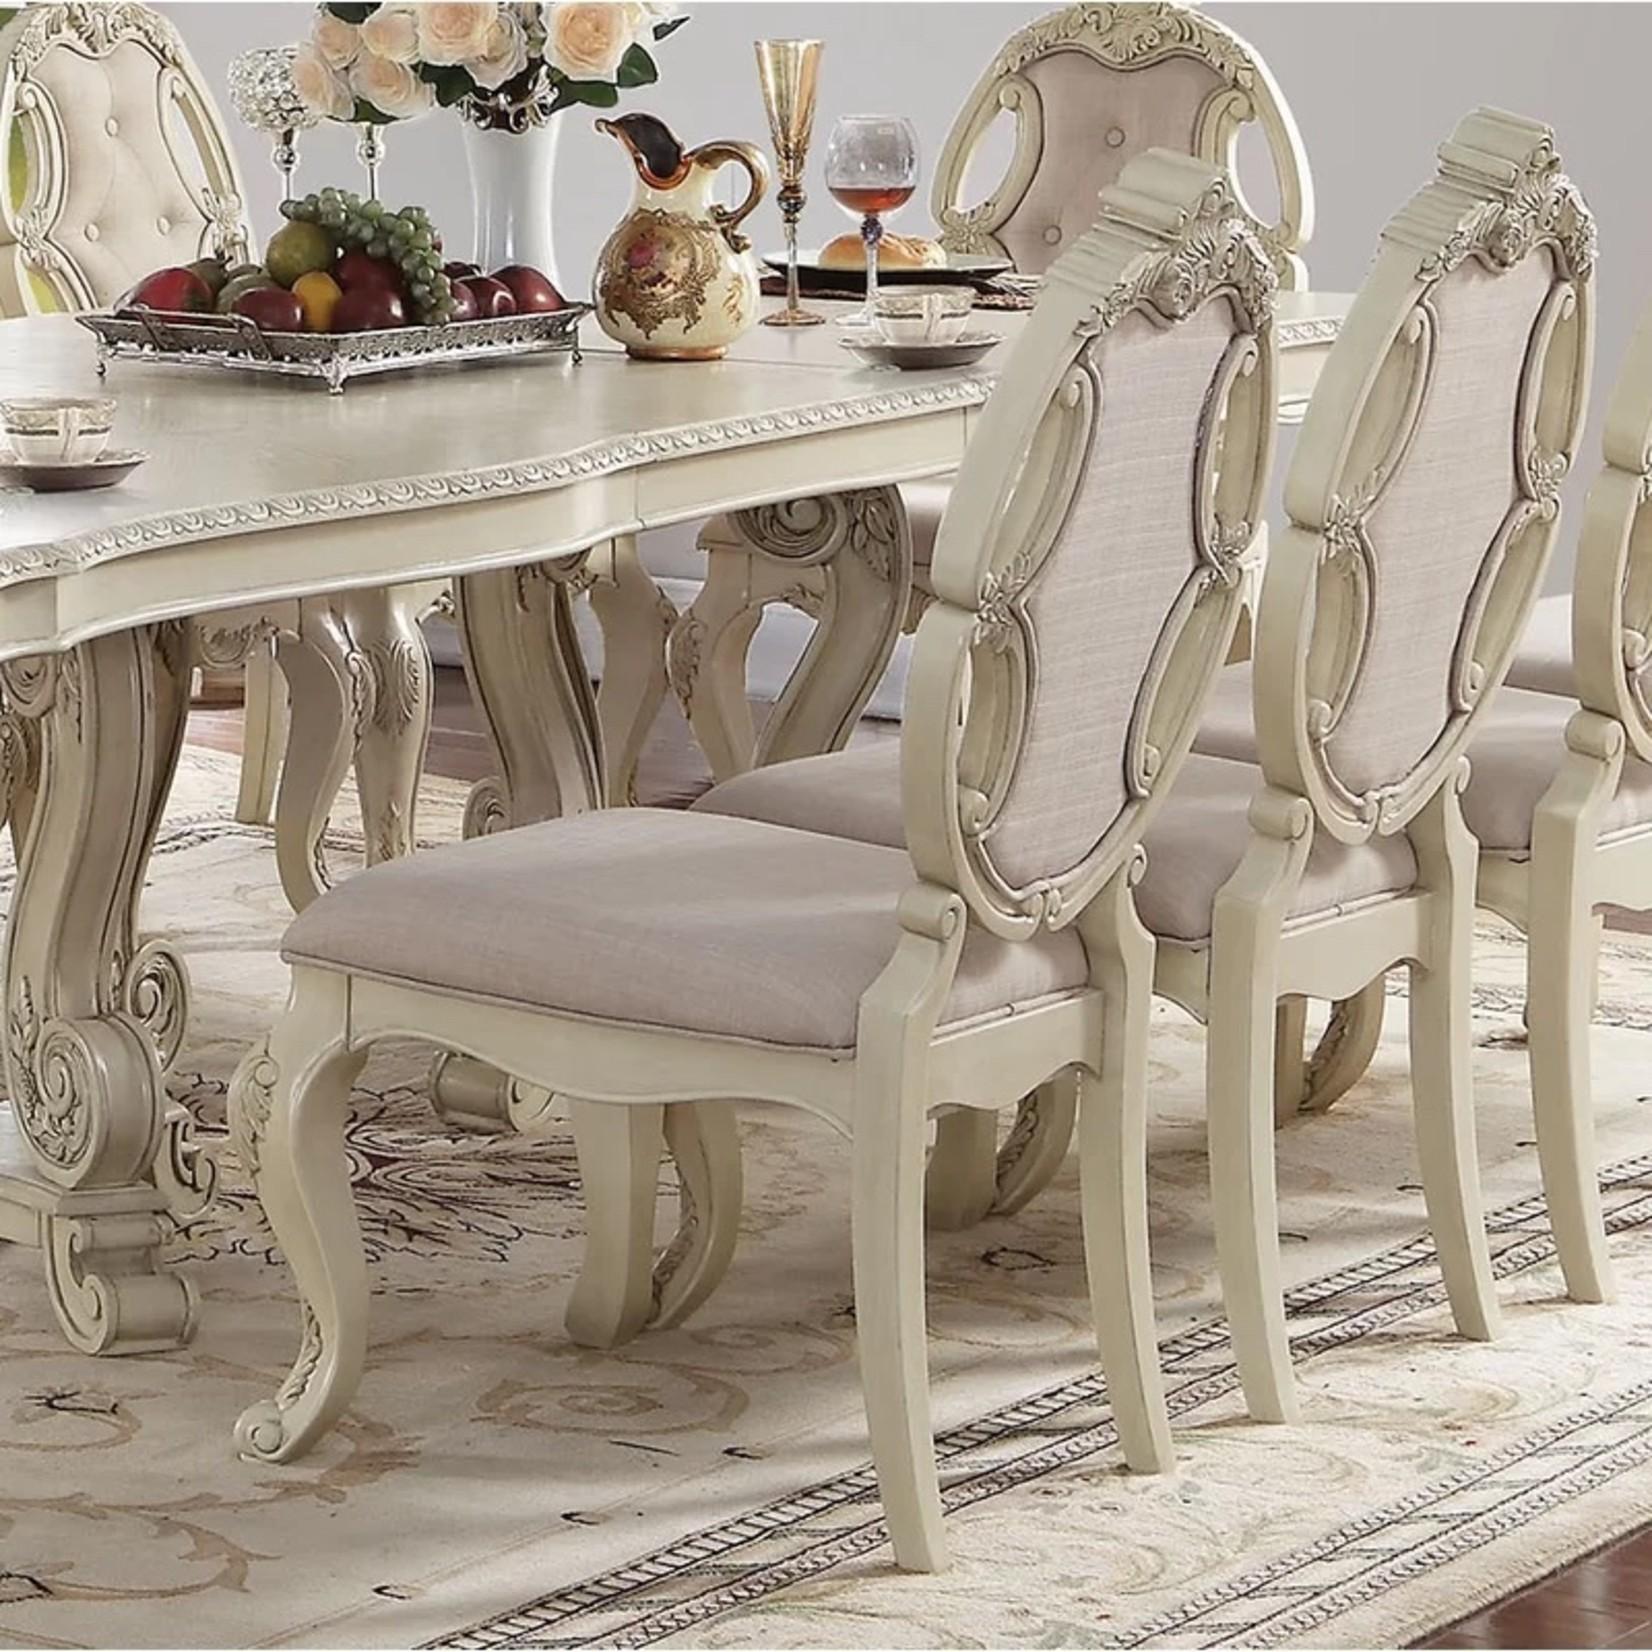 *Larosa Upholstered Dining Chair Set of 2